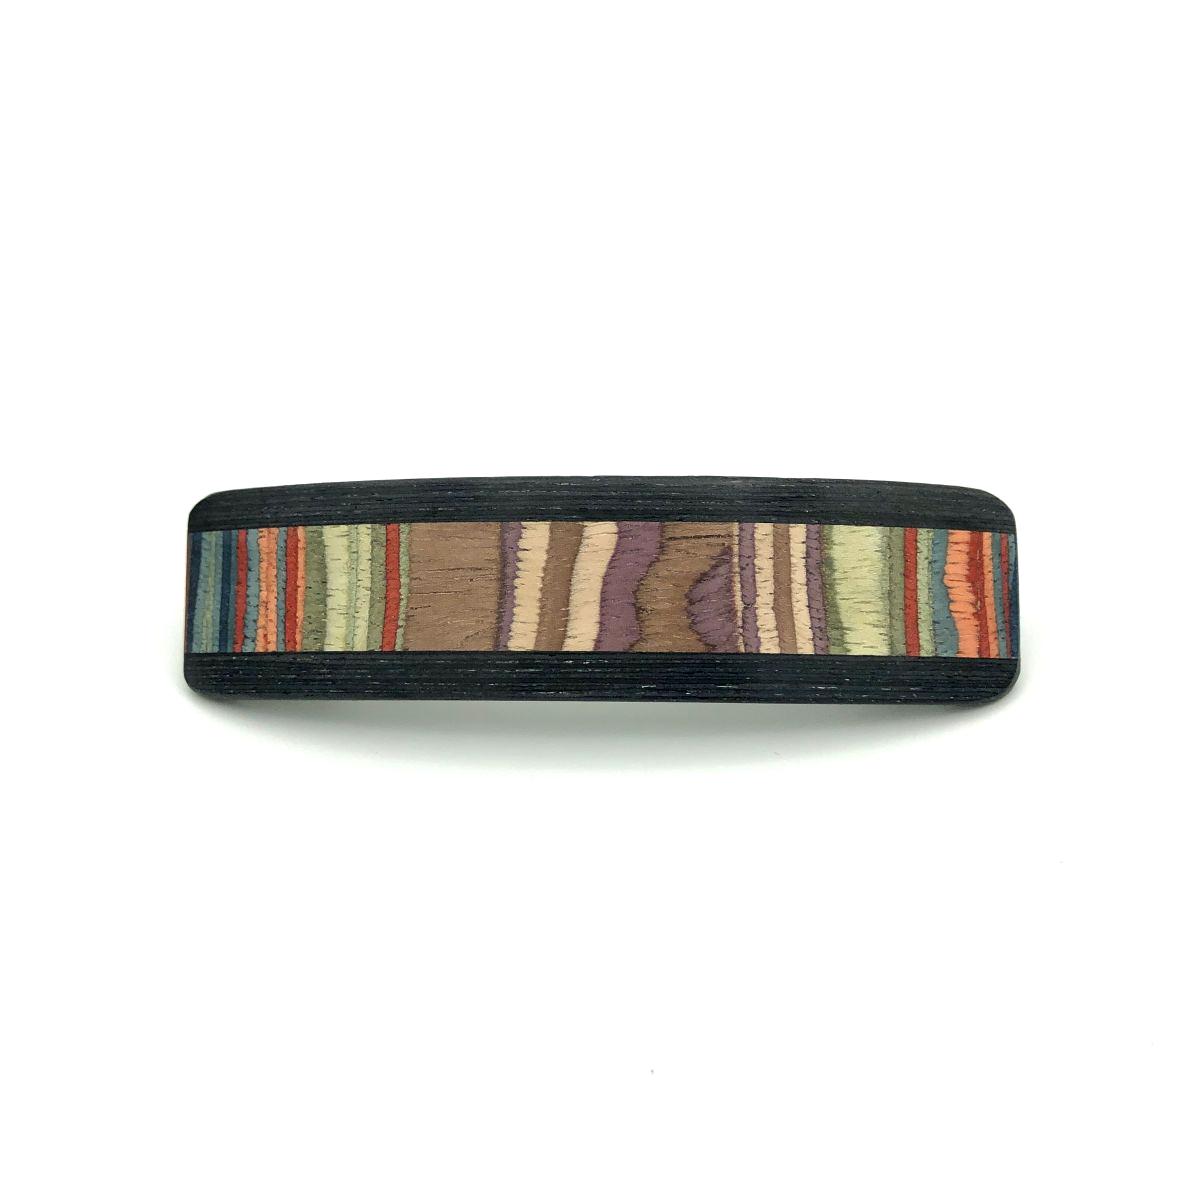 Haarspange aus Holz lila/bunt - groß, schmal - 10,5 cm